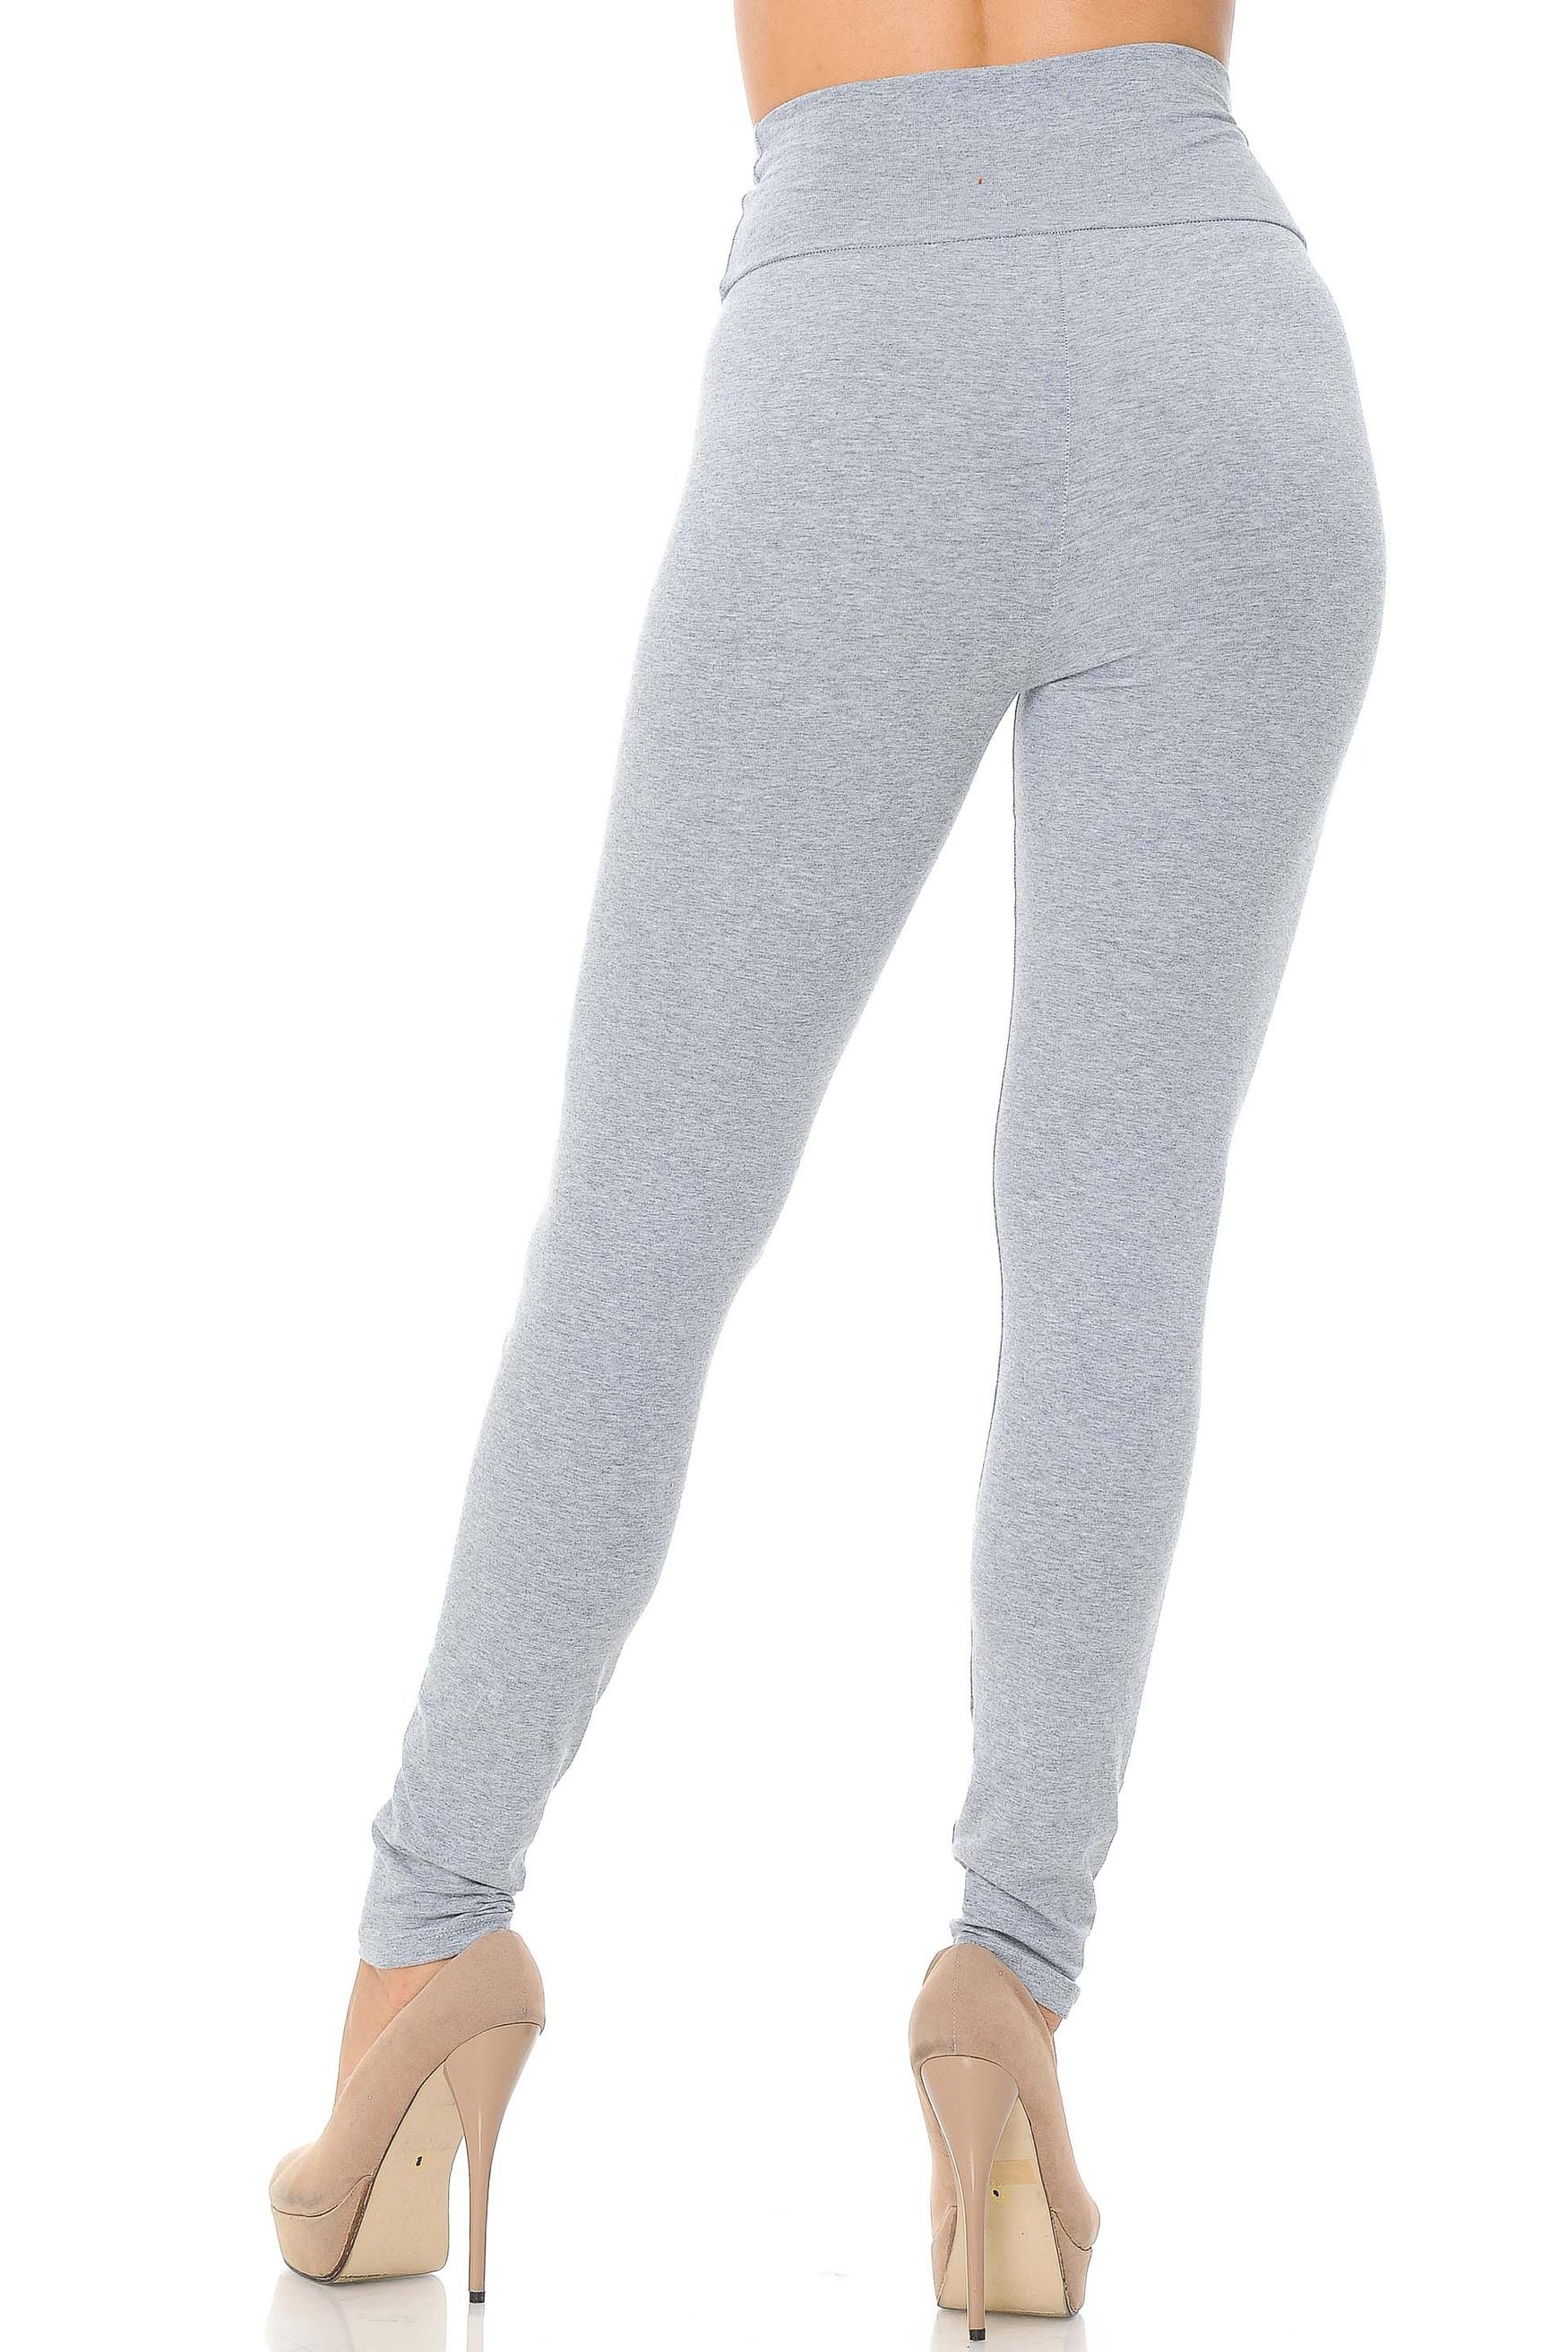 Heather Grey USA High Waisted Cotton Leggings Back